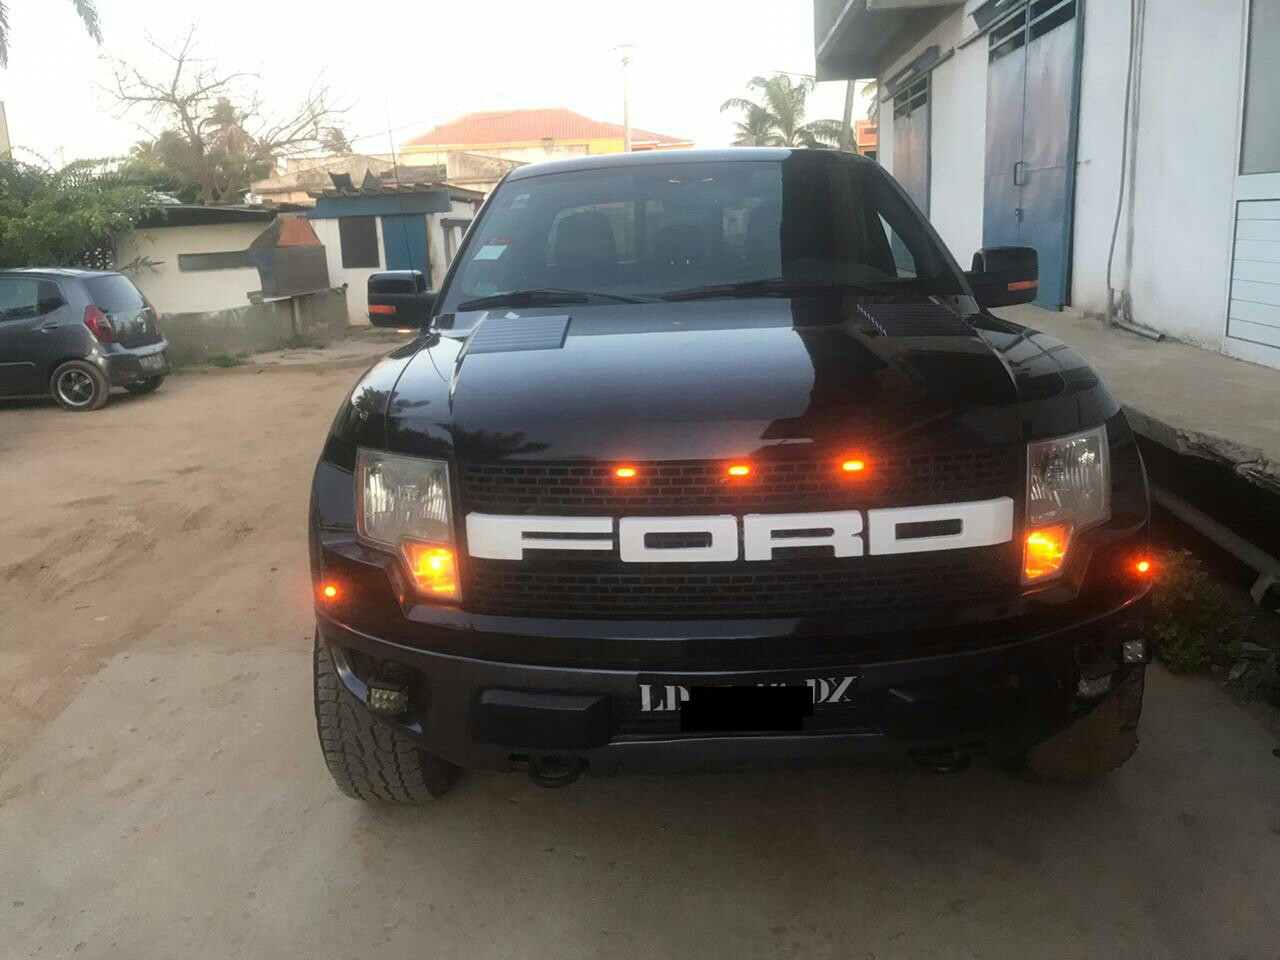 Vende-se esta Ford Raptor | preço 13 milhoes | Gps cacuaco/Camama